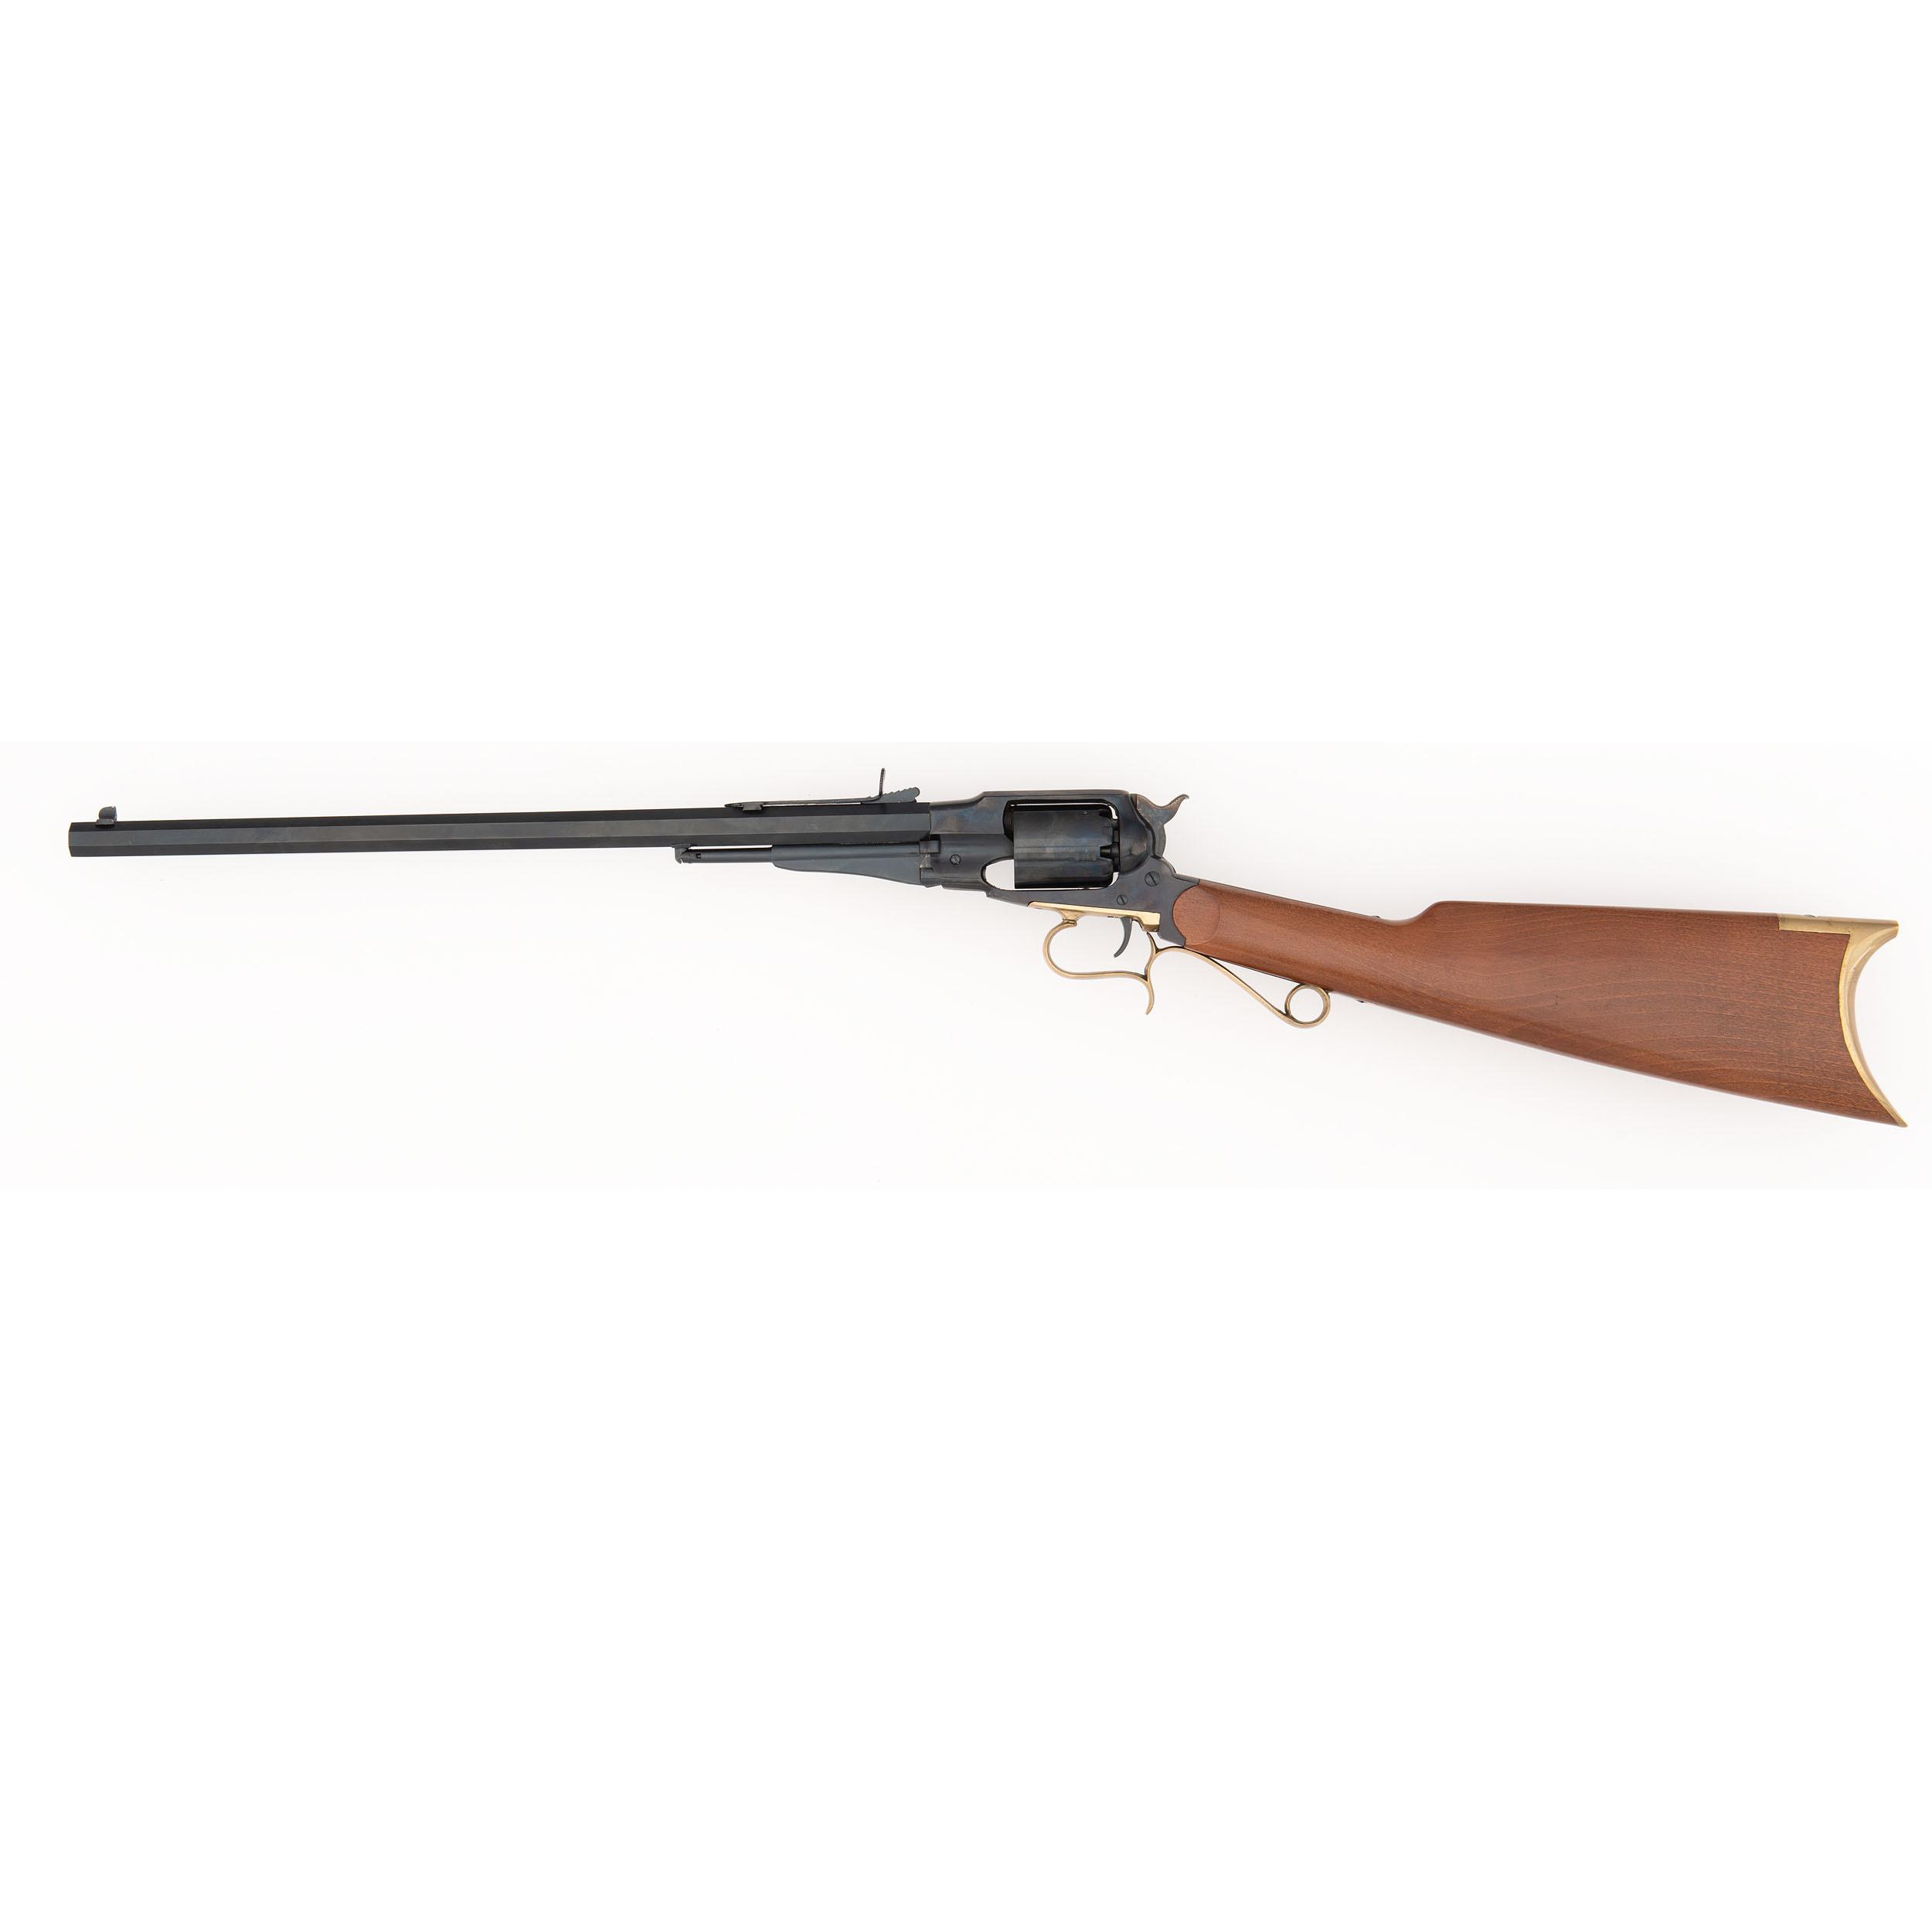 Reproduction Remington 1858 Carbine by Uberti | Cowan's